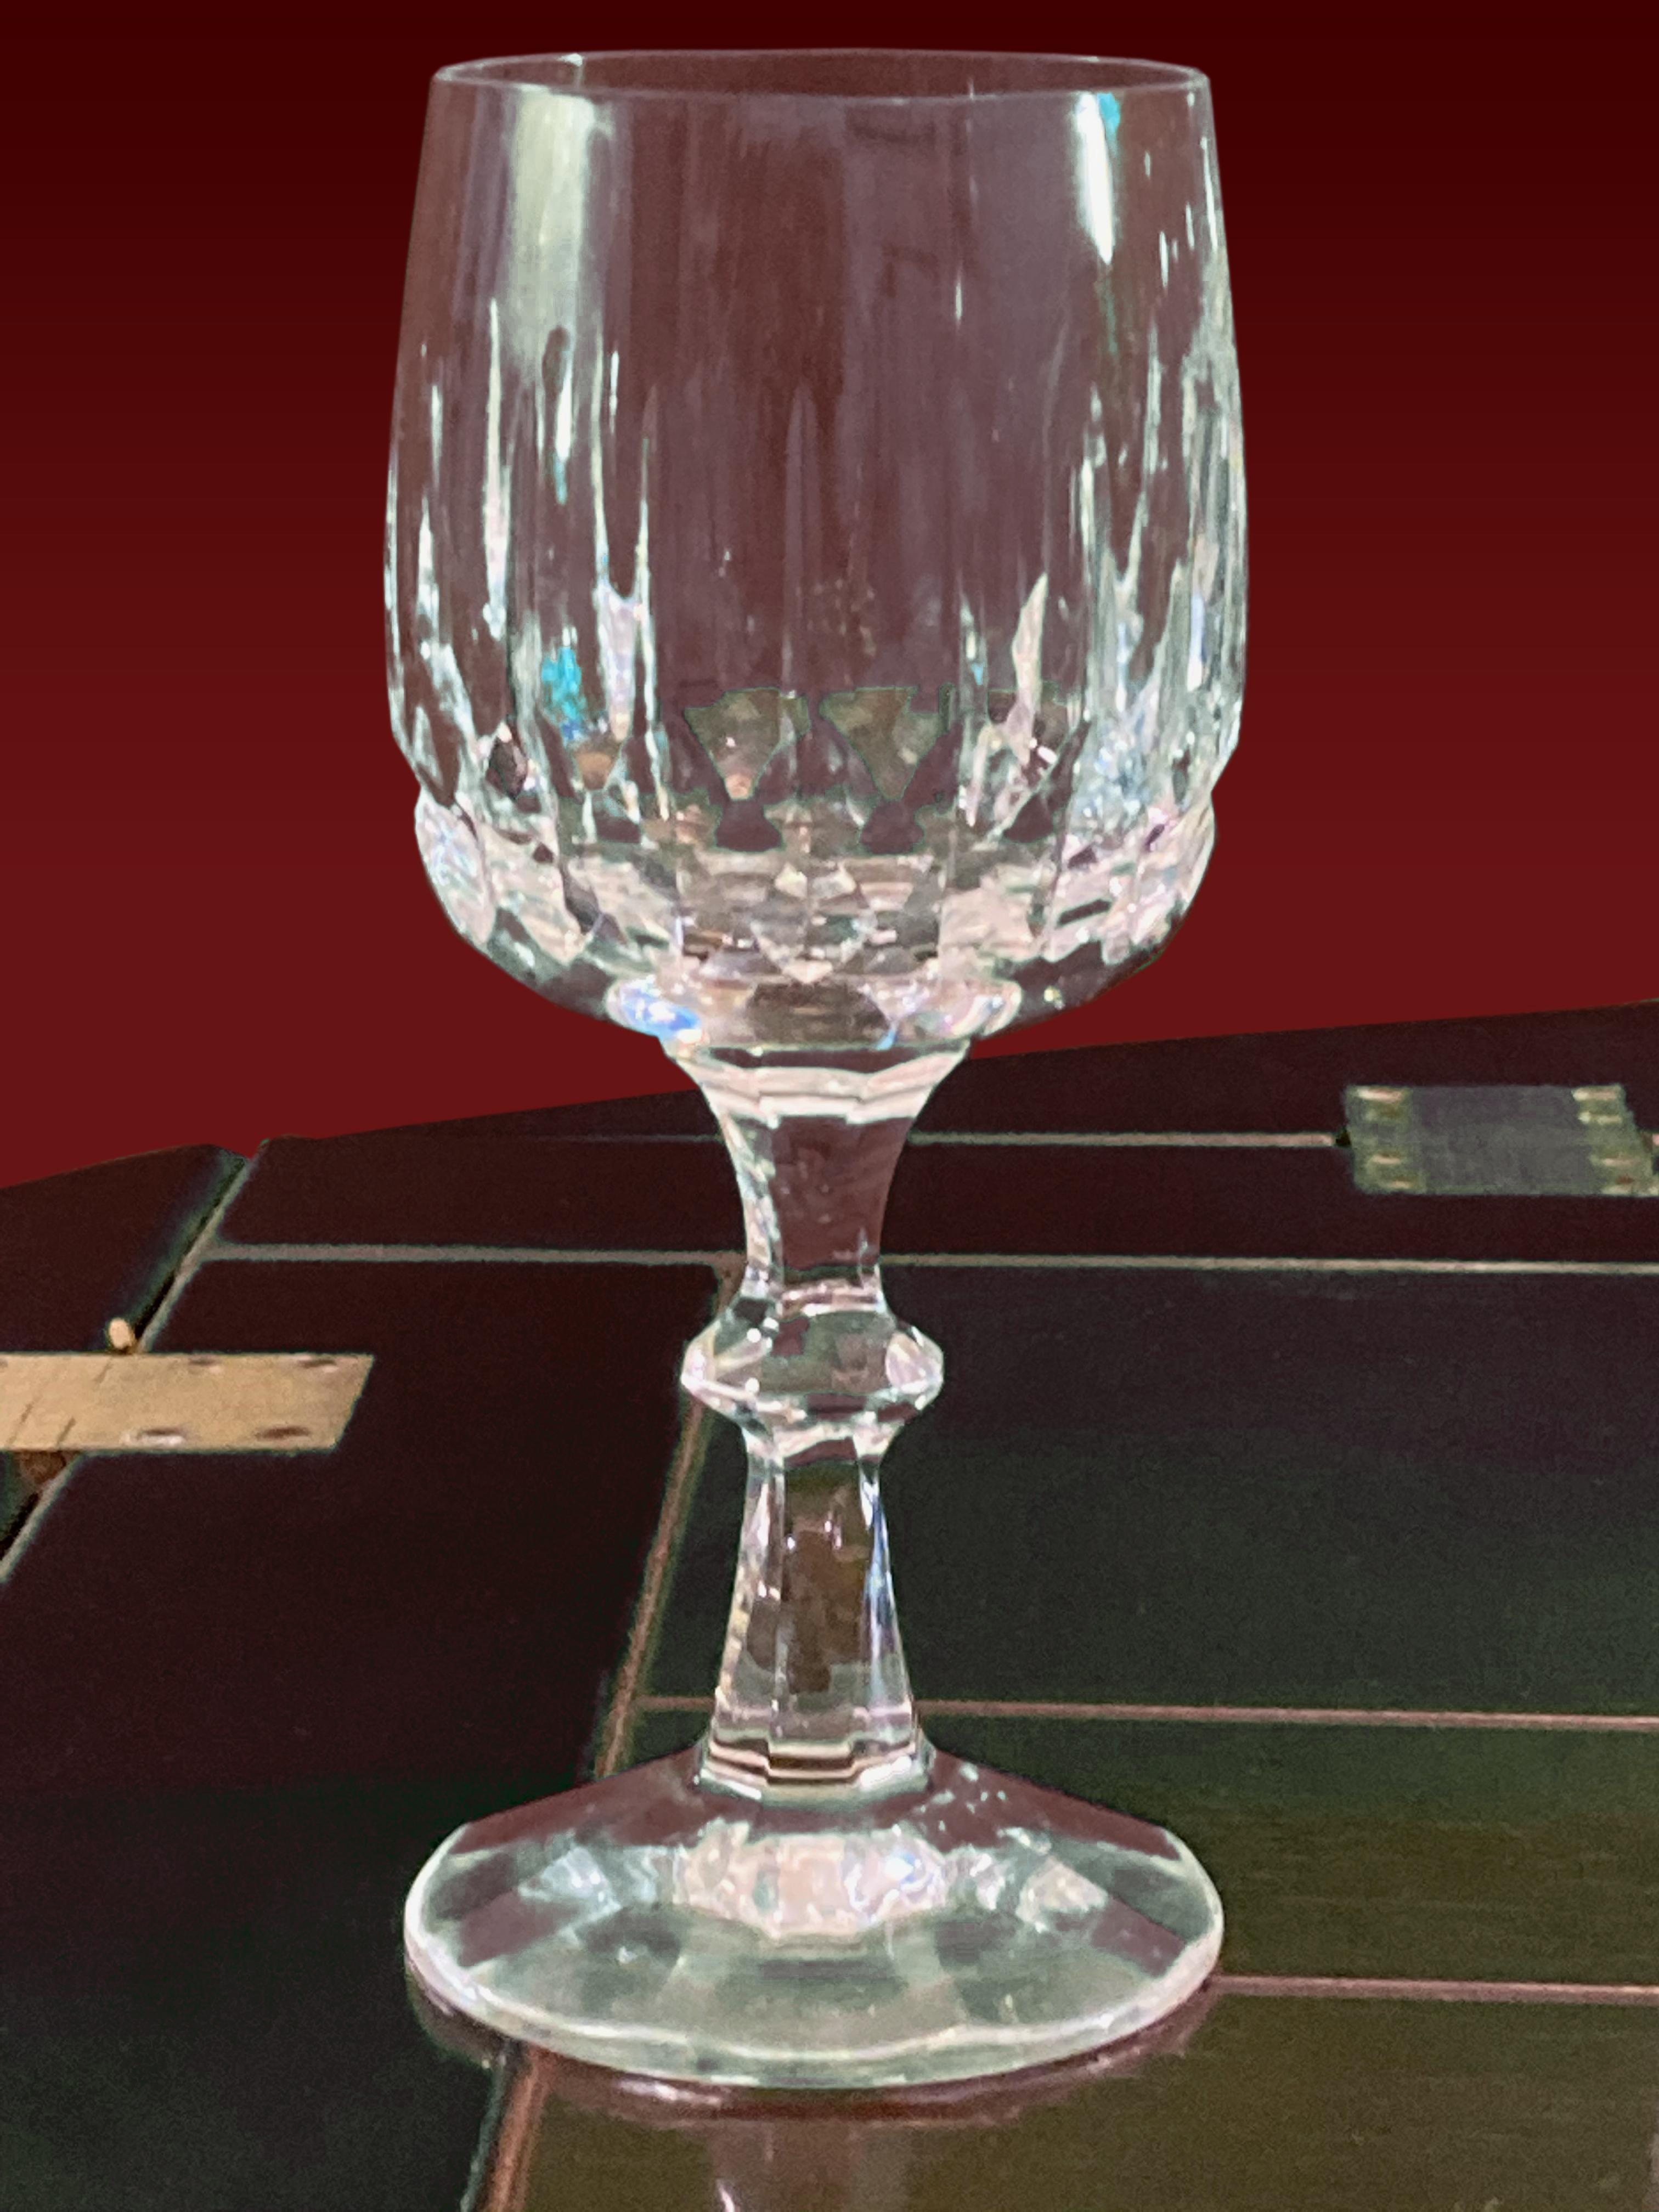 WineGlas2-Single copy